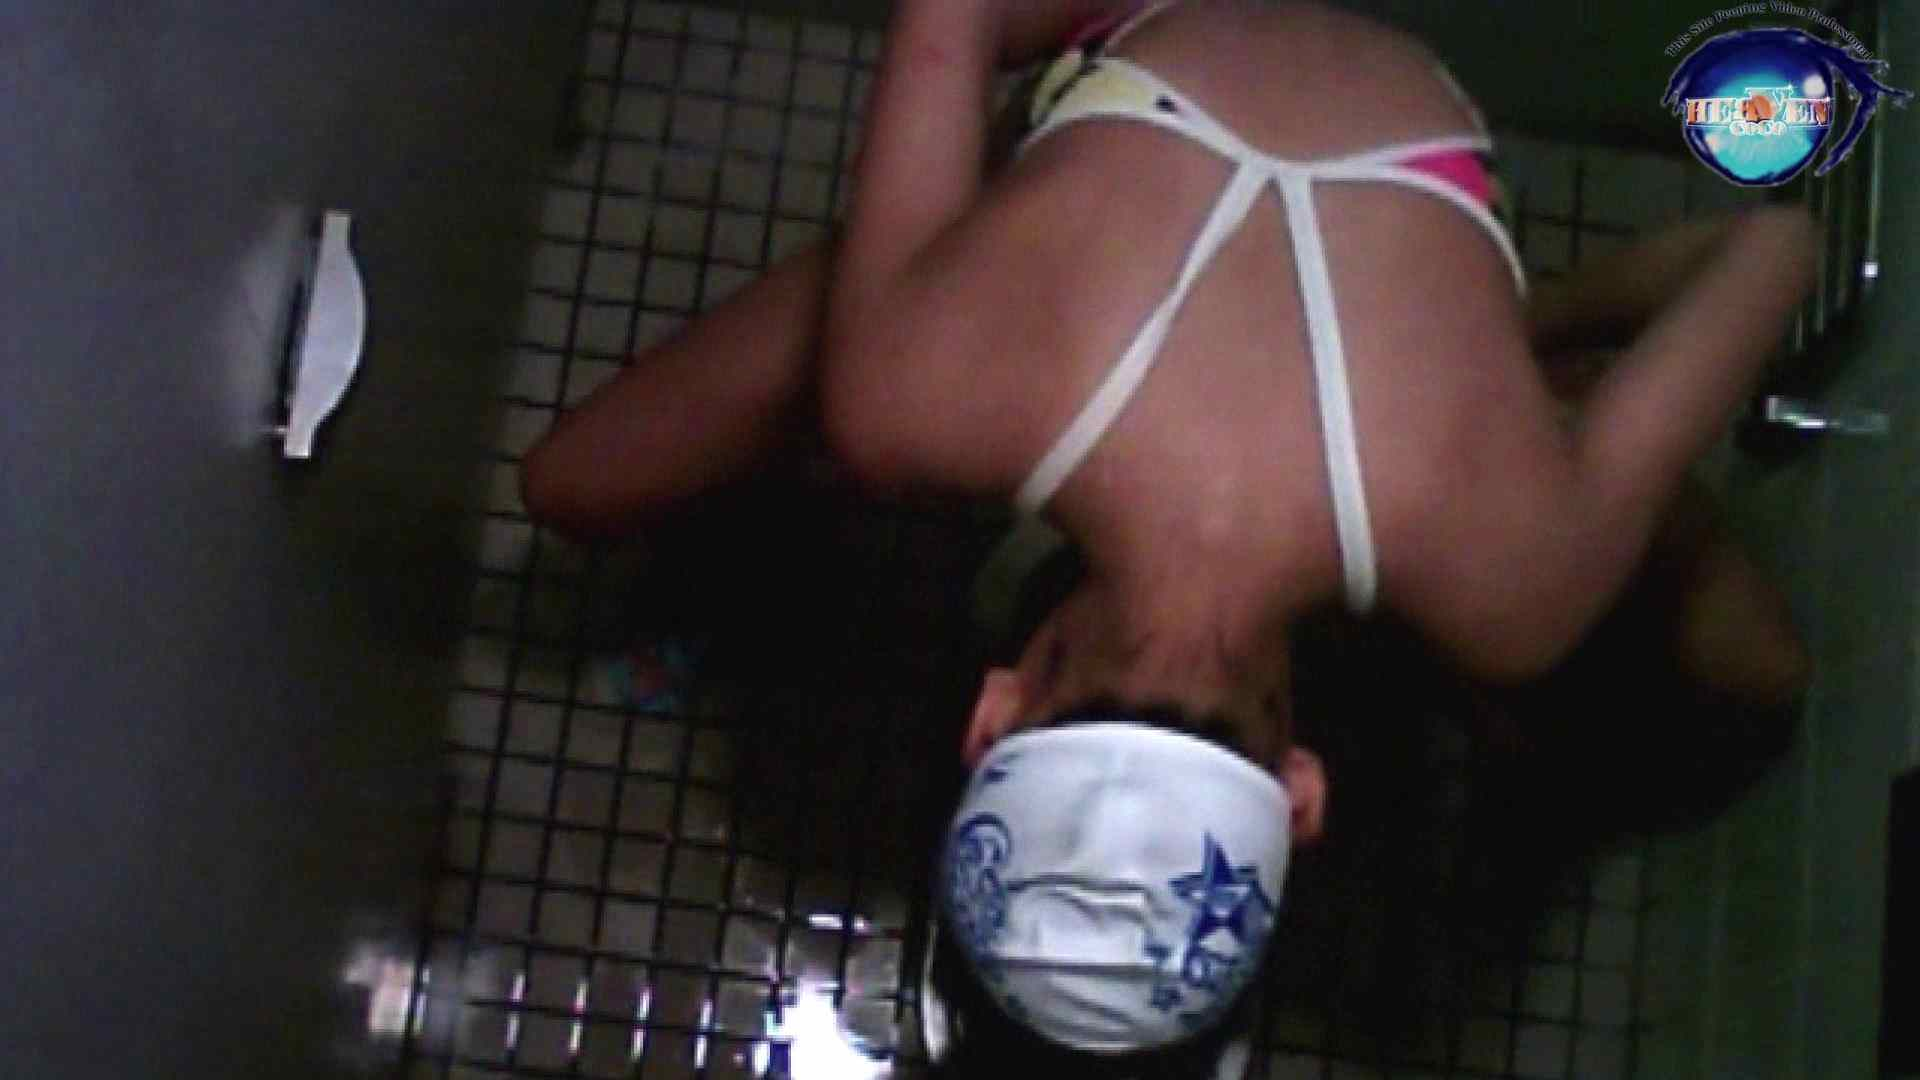 水泳大会選手の聖水 vol.09 トイレ   全裸 盗撮 106PIX 29